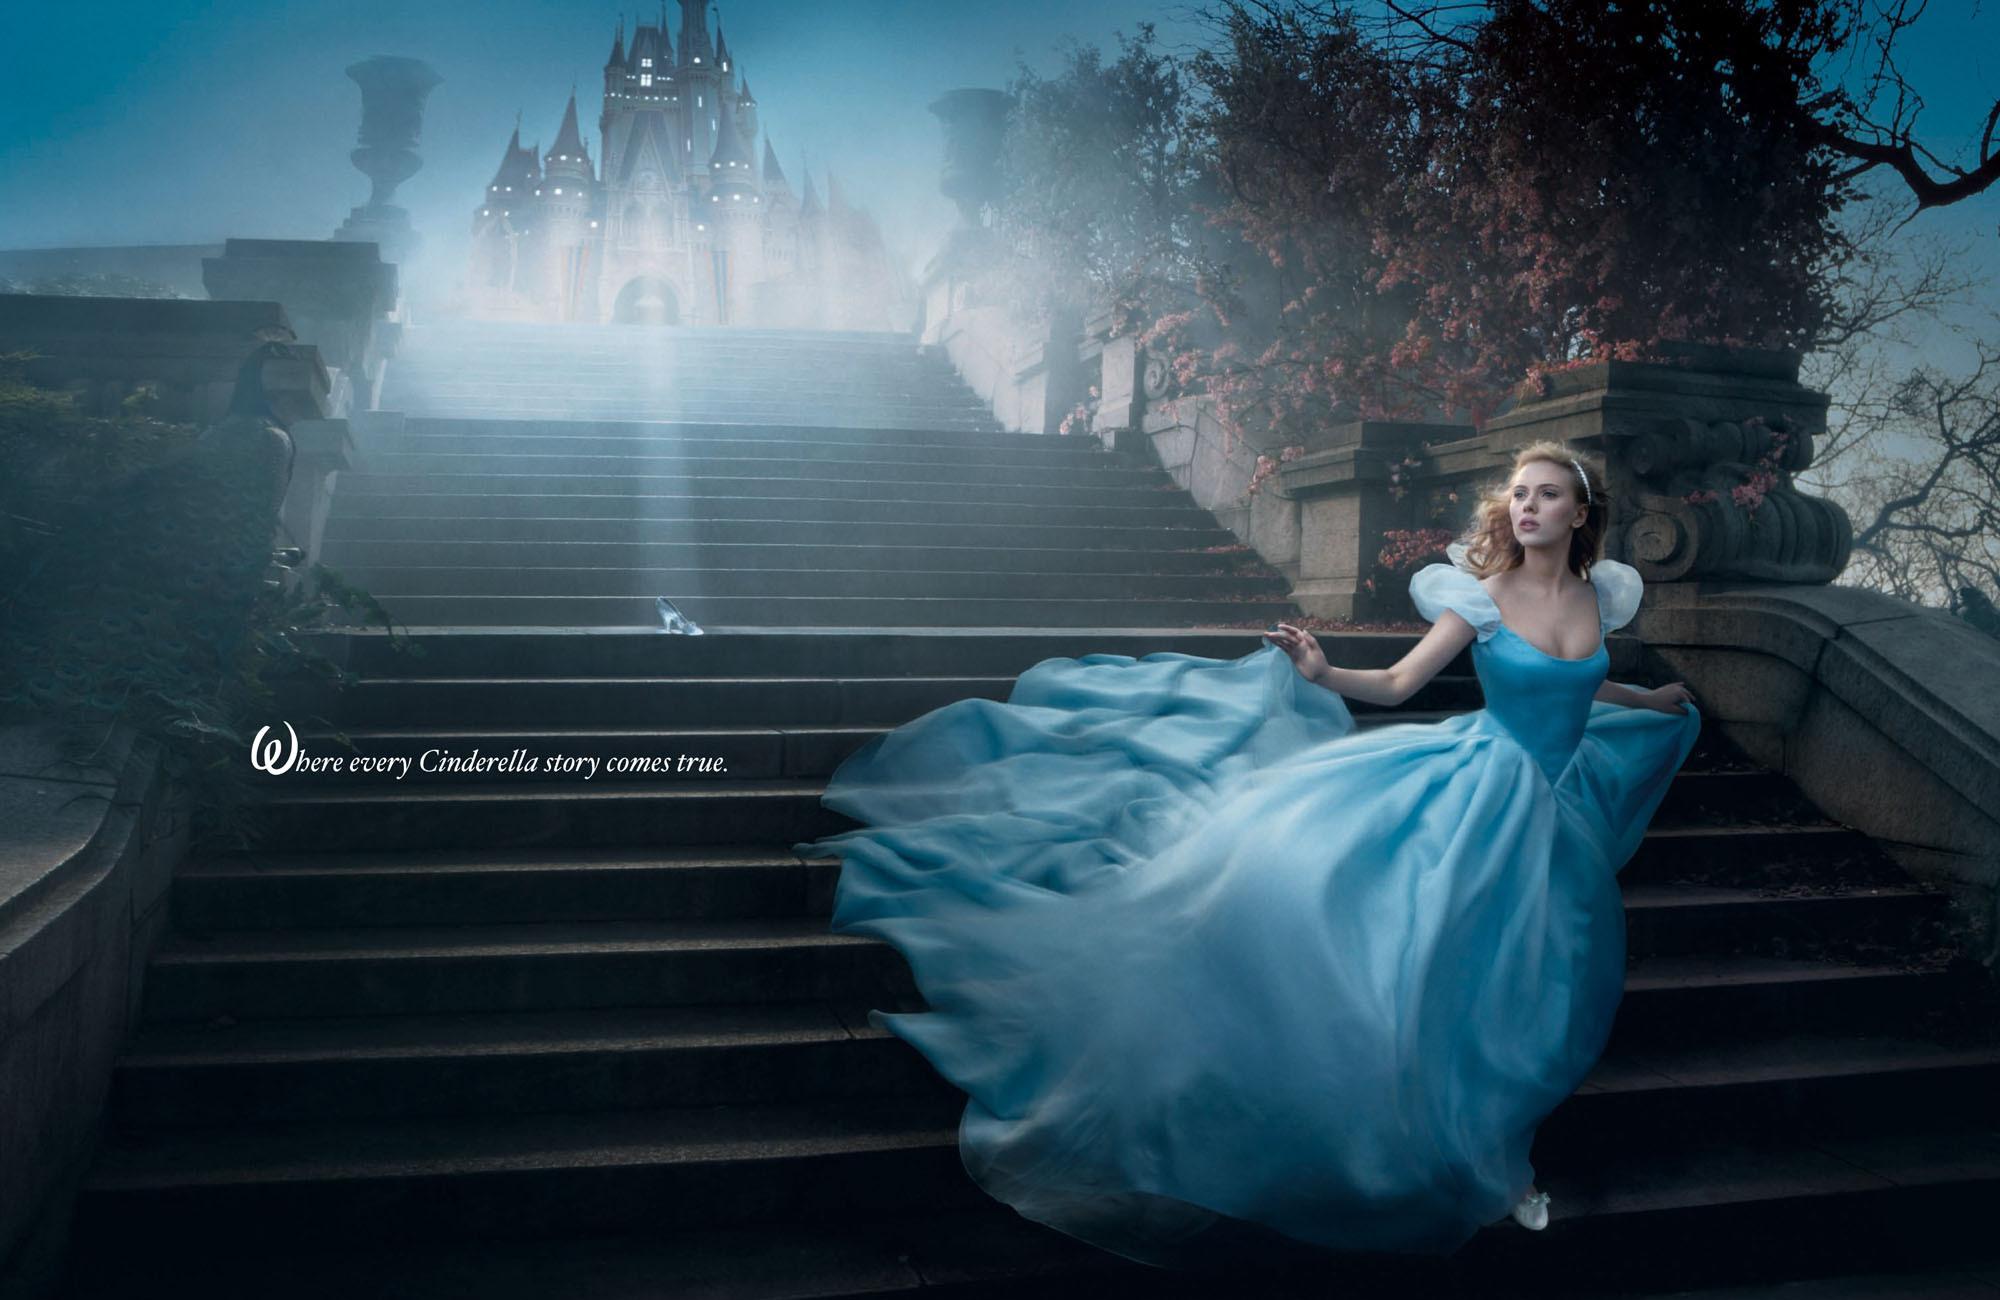 Annie Leibovitz/Disney Parks Cendrillon